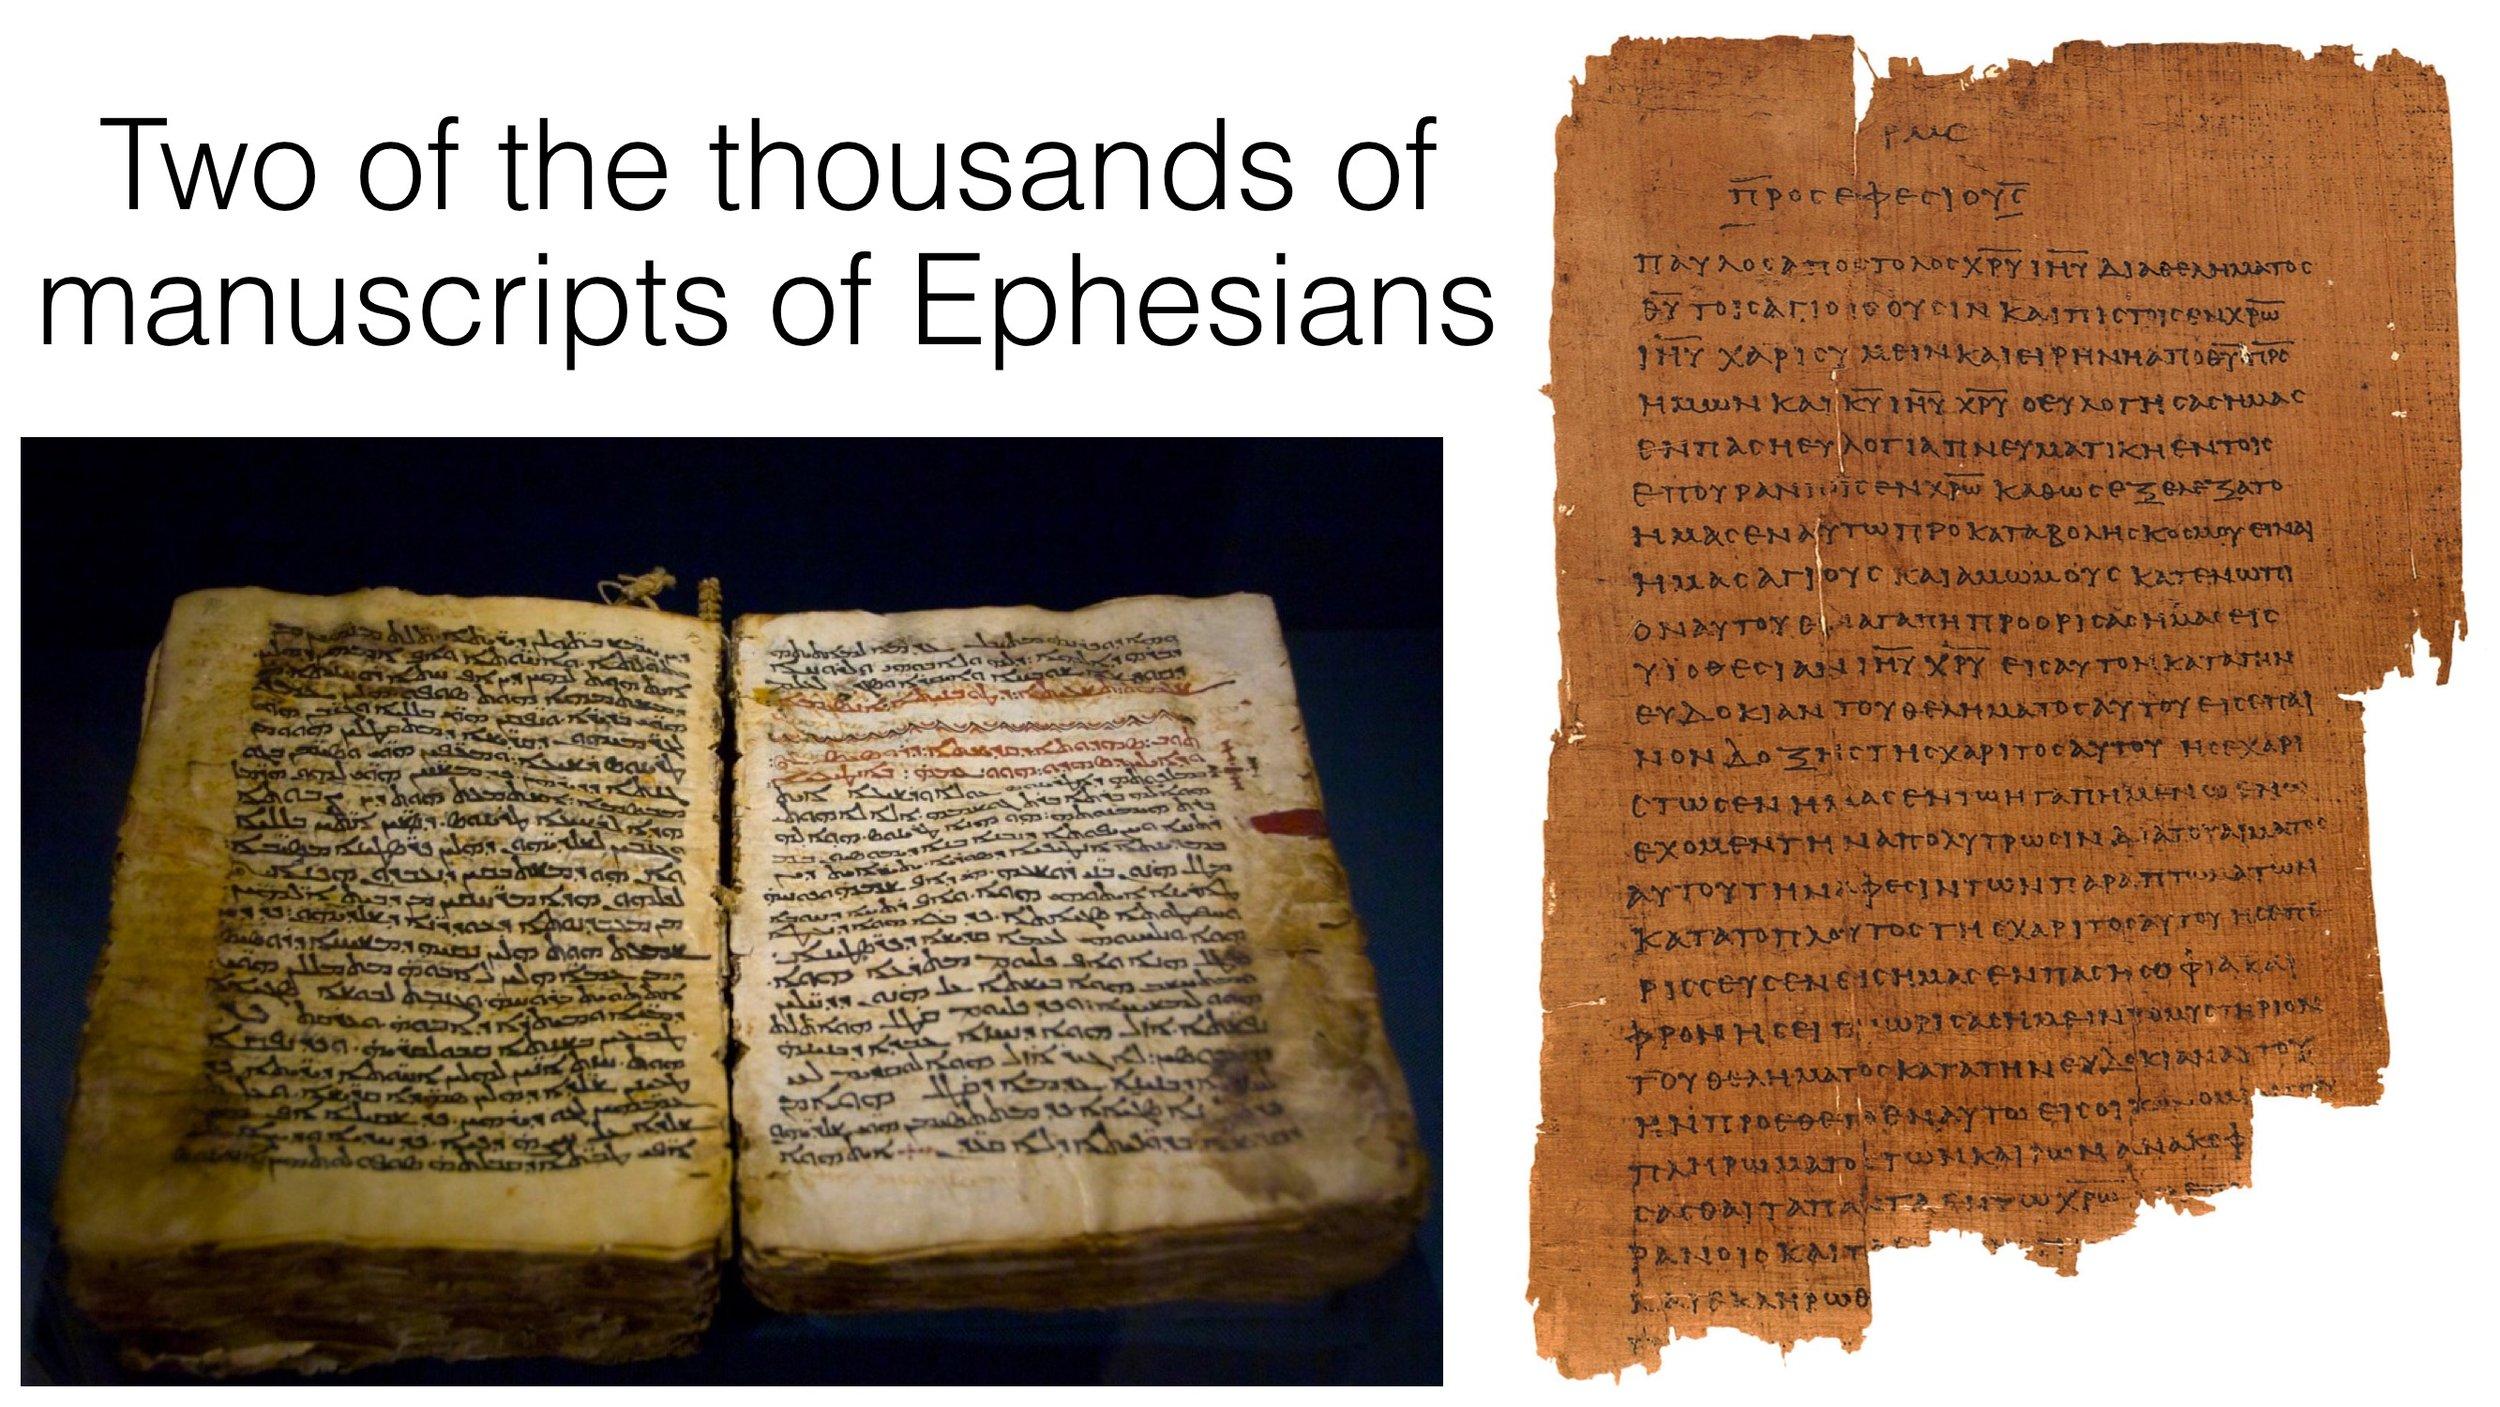 2018JAN28 - Sermon #5. Calvary Bible Church. 1.28.18 Intro to Ephesians 2.jpeg